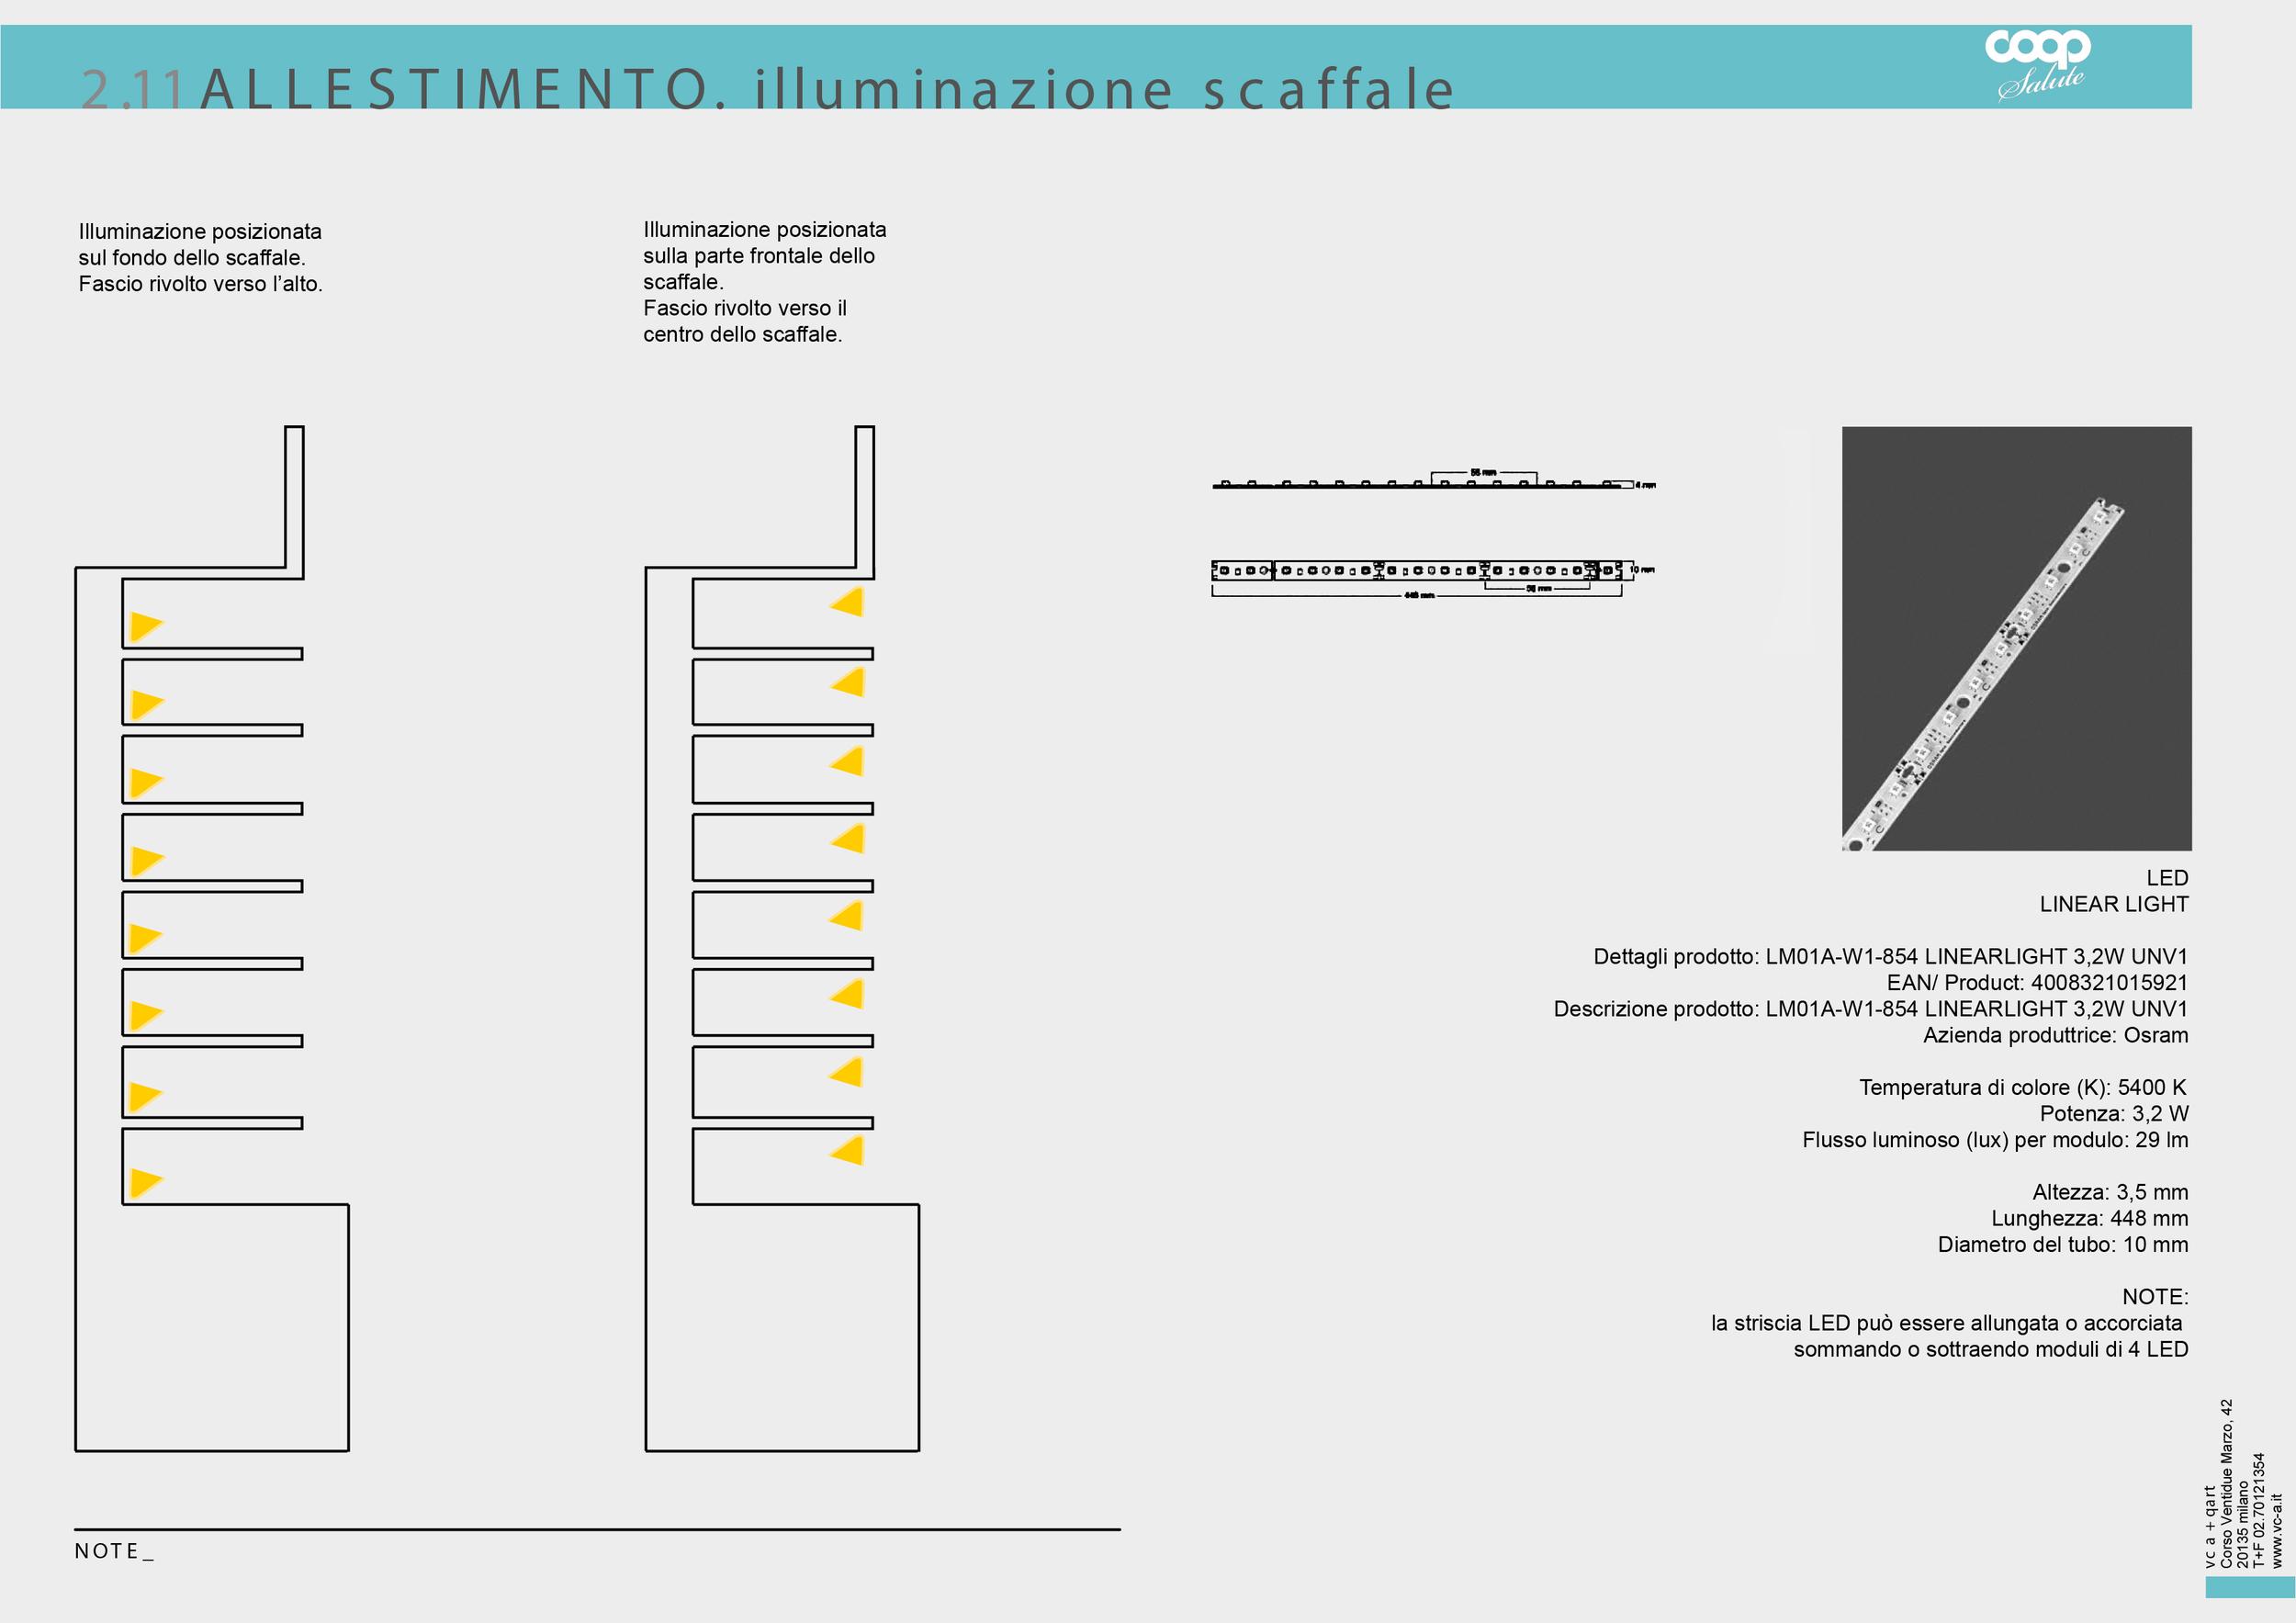 Farma-Coop-MANUALE-16.jpg